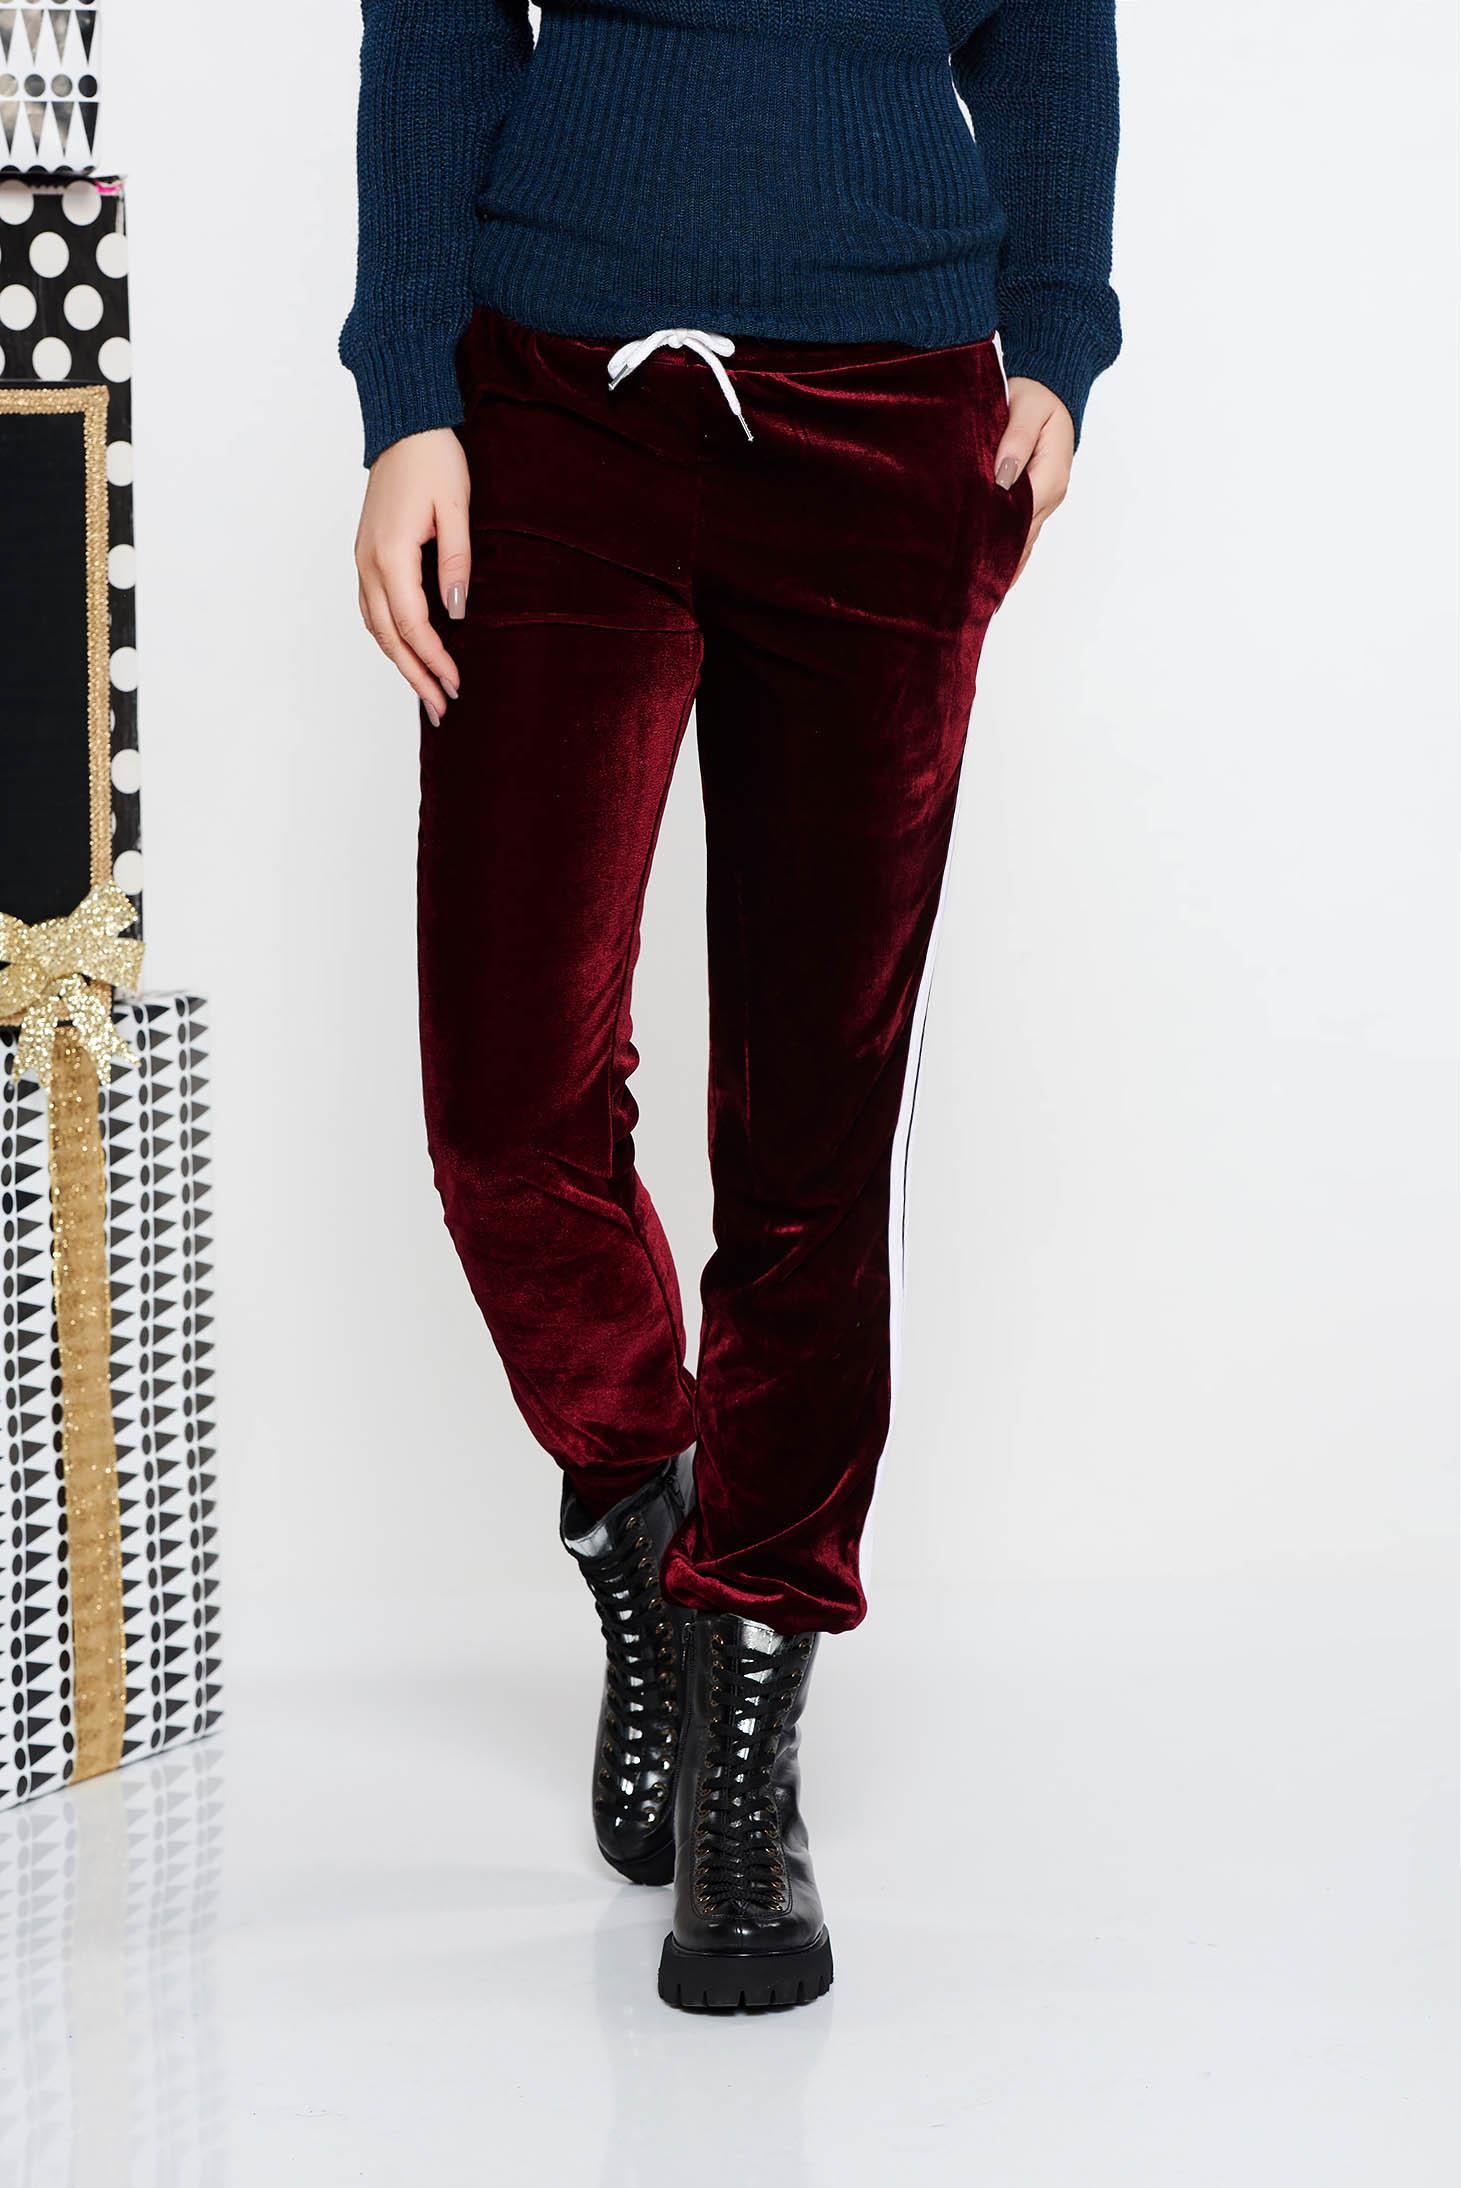 Pantaloni SunShine visinii casual cu talie medie din catifea cu buzunare cu elastic in talie